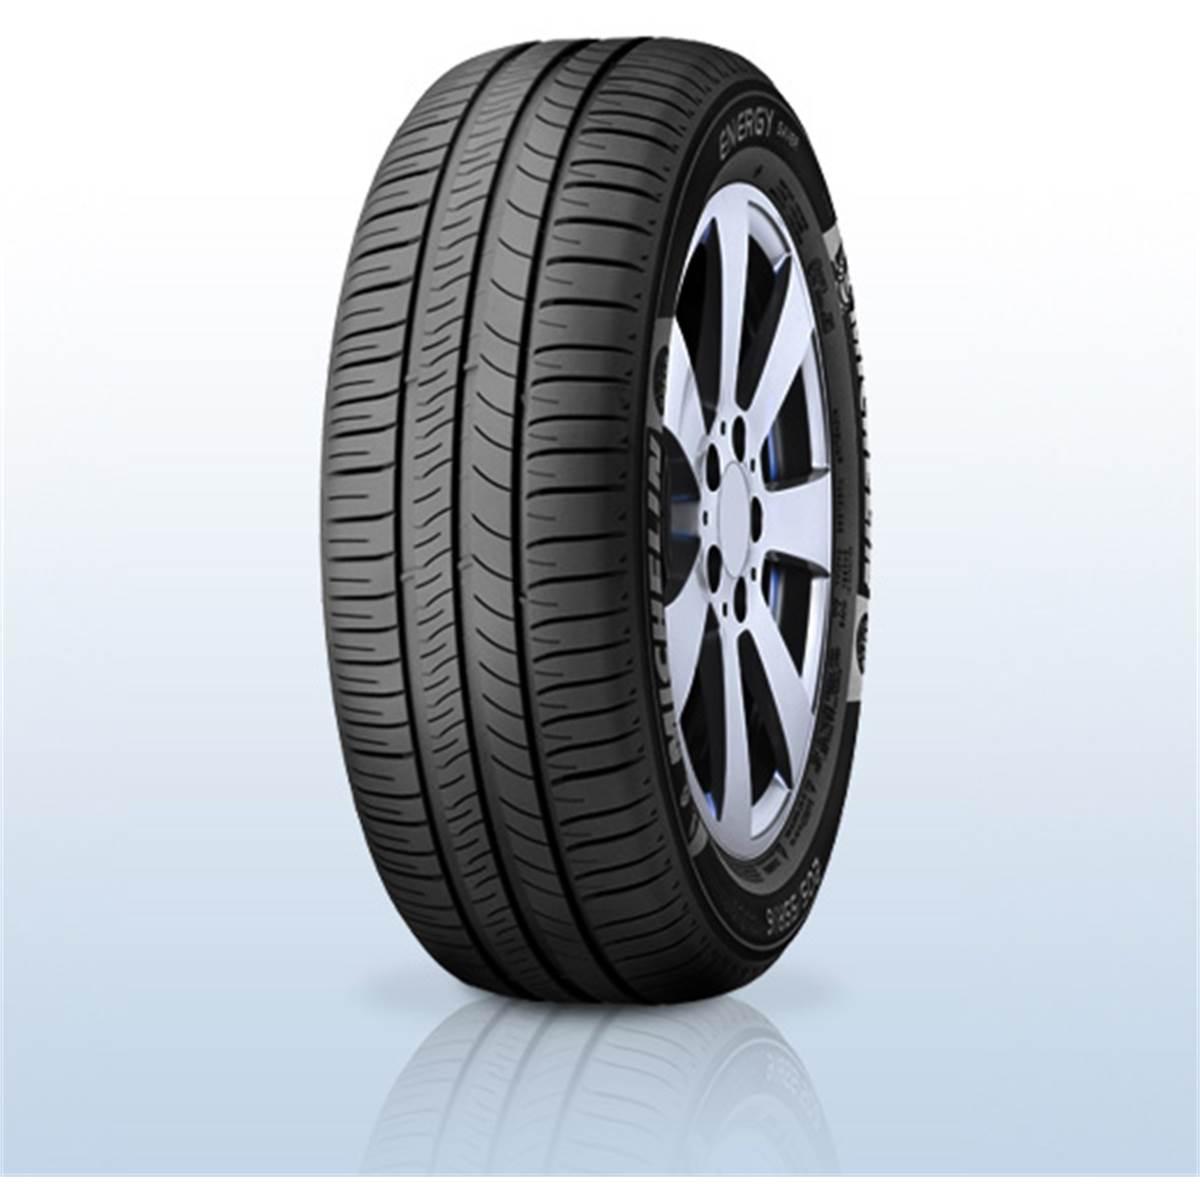 Pneu Michelin 185/60R15 88H Energy Saver + XL